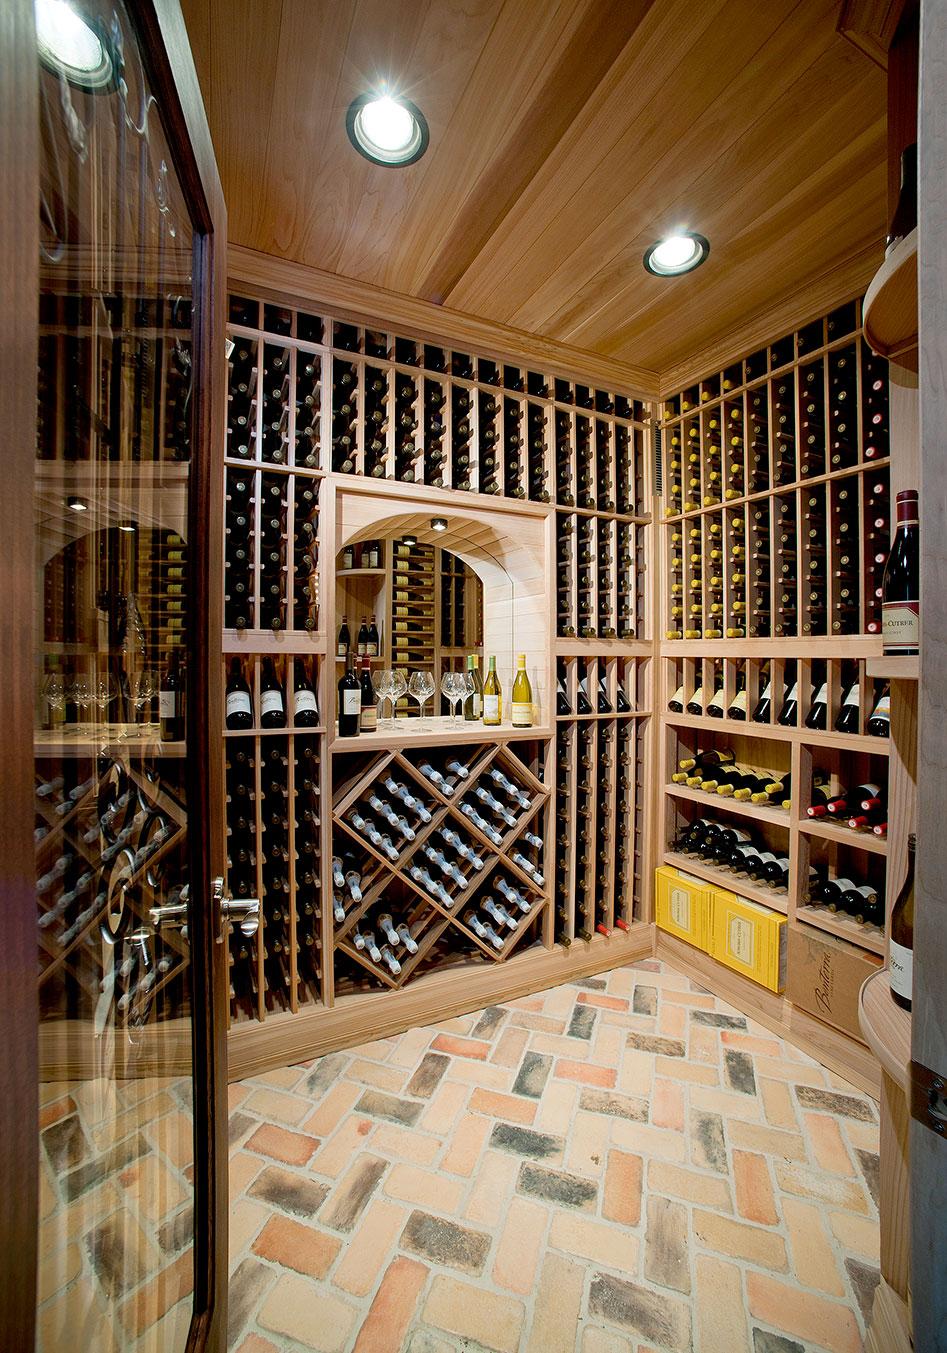 huge wine cellar